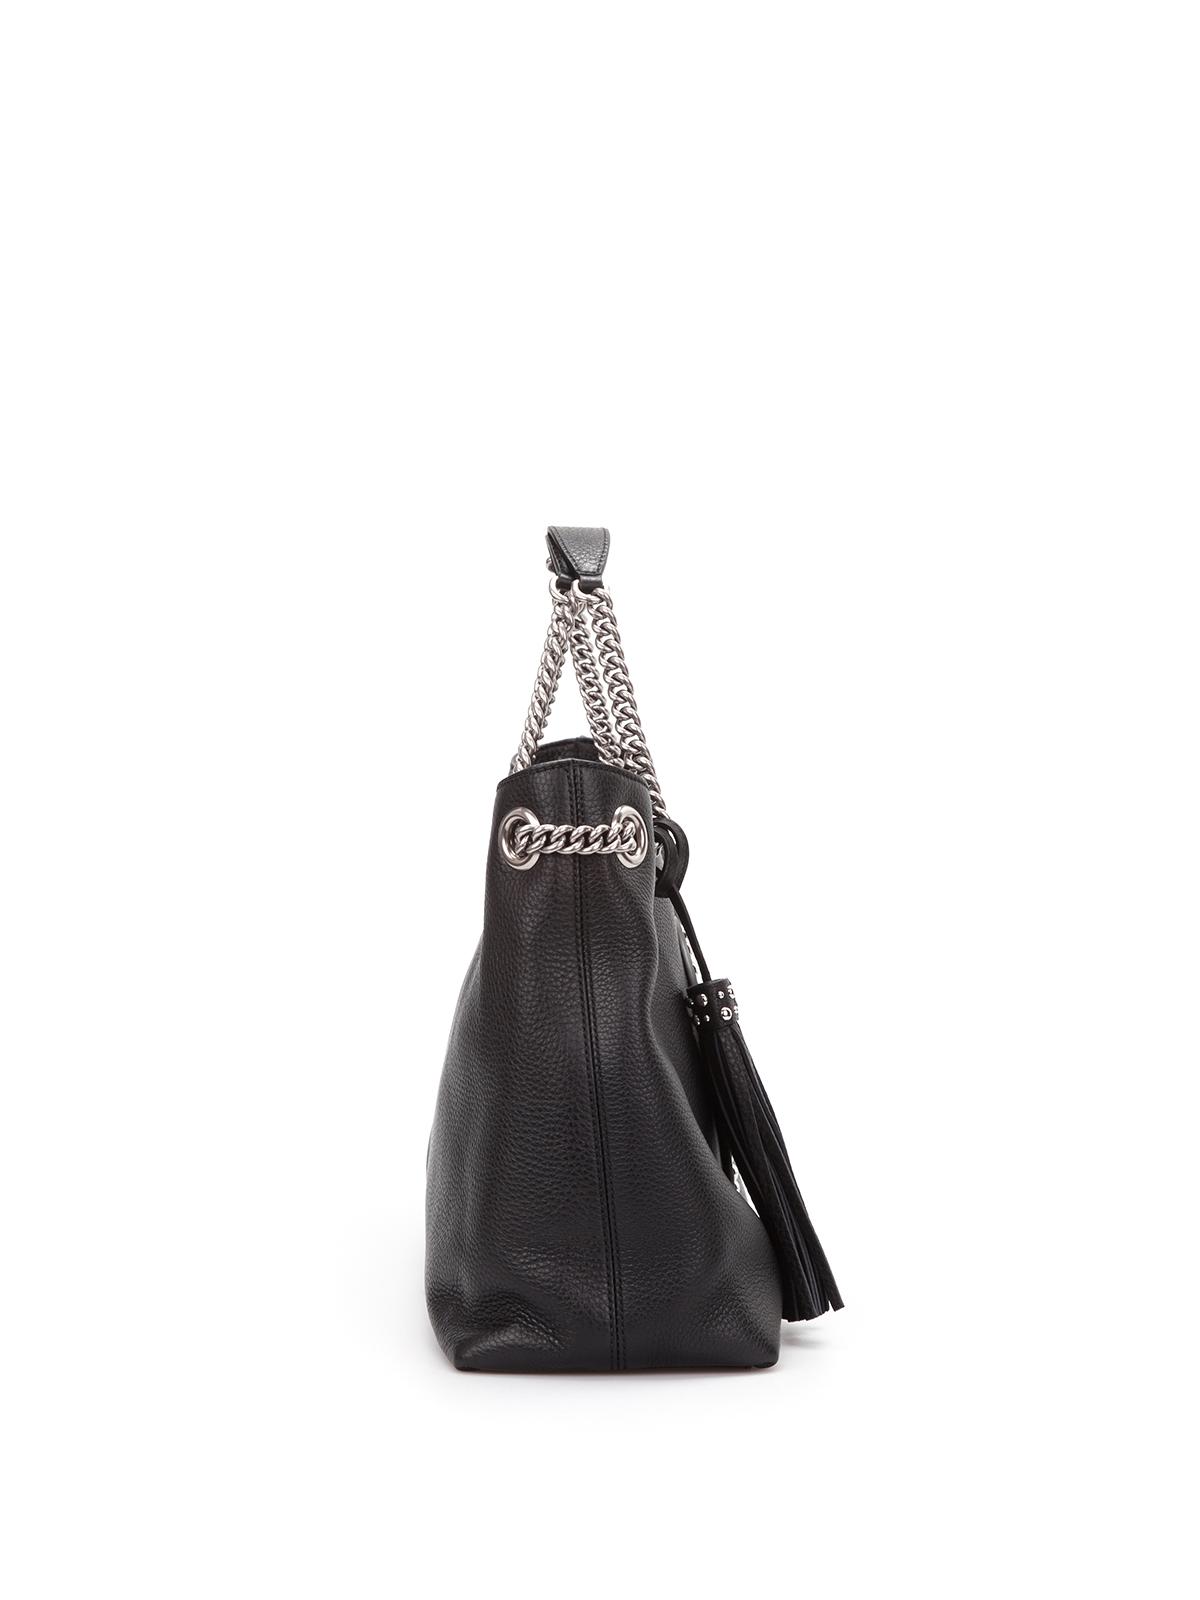 cf1f5f62949e Gucci - Soho studded leather shoulder bag - totes bags - 308982 ...